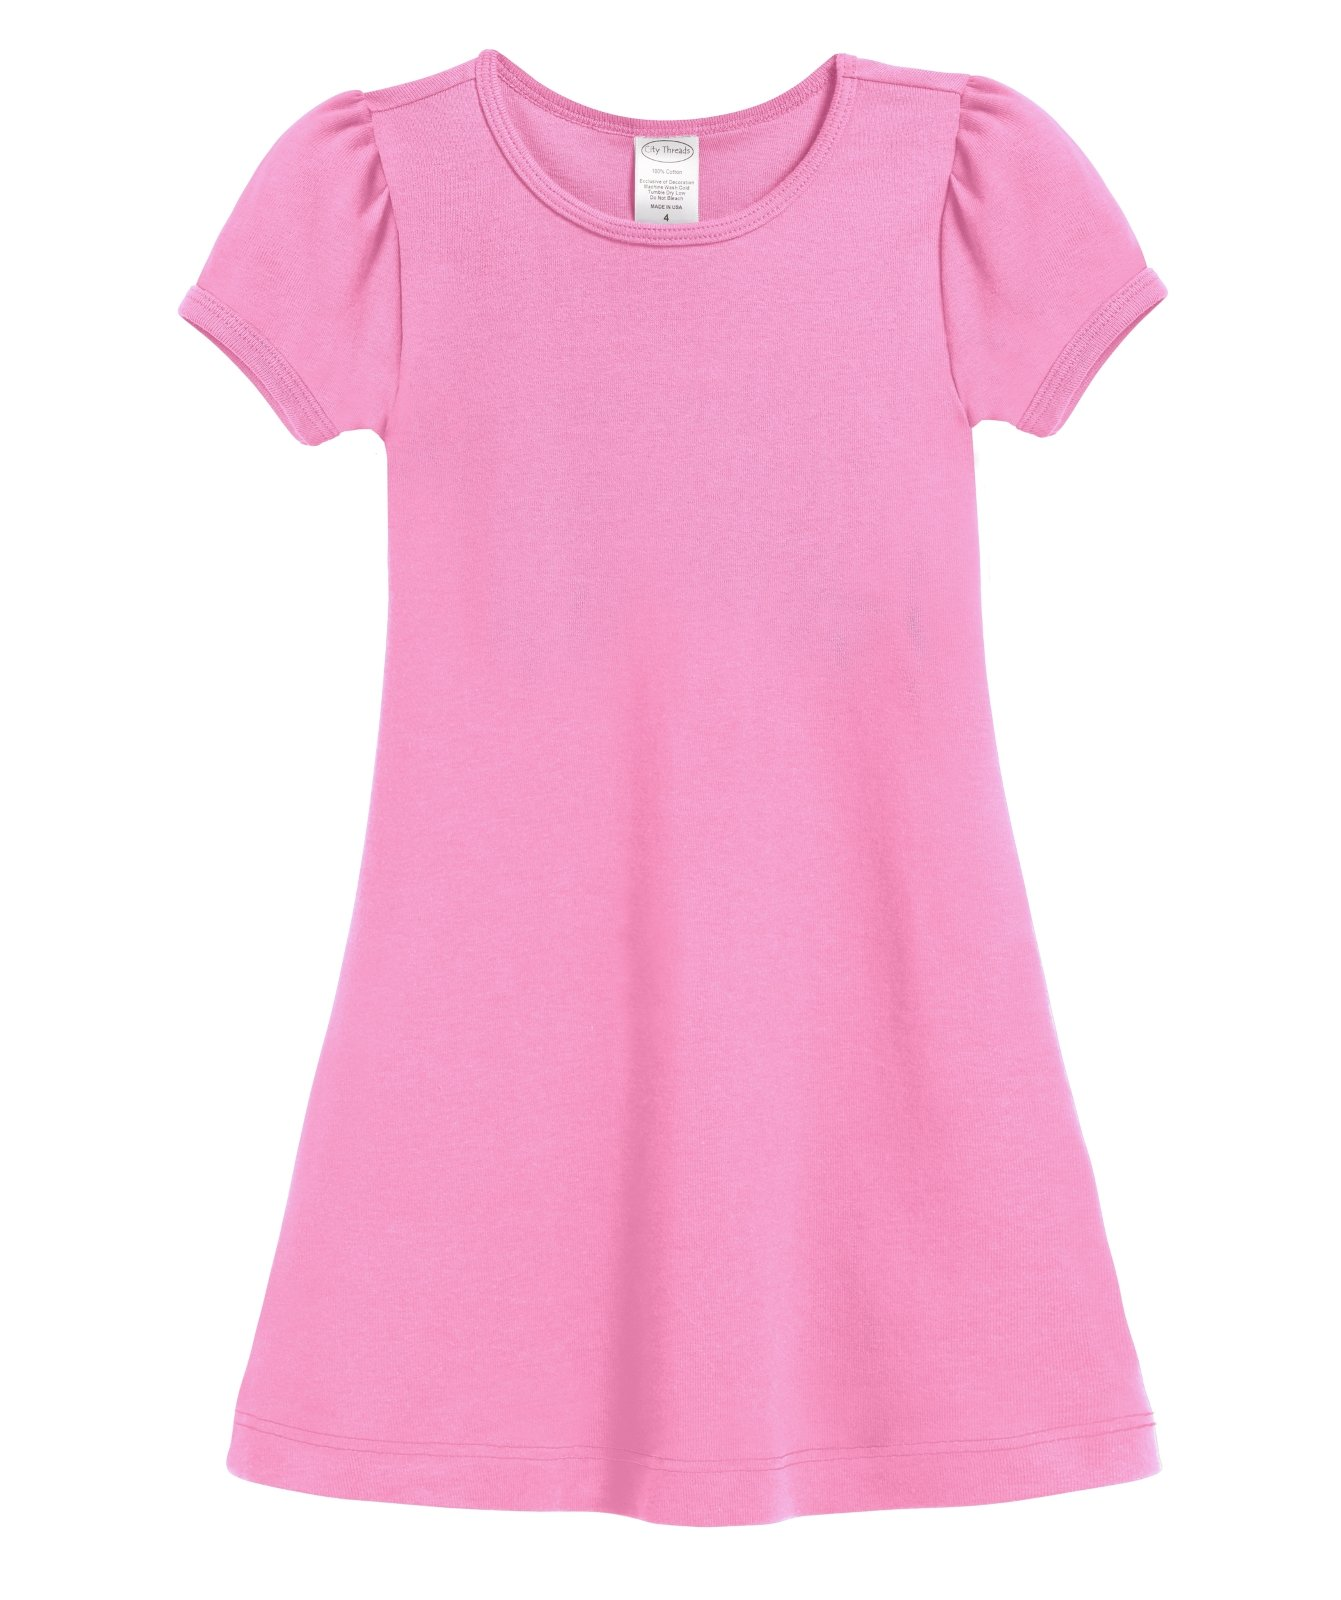 City Threads Girls' Short Sleeve A-Line Puff Sleeve Party Dress for Sensitive Skin/SPD/Sensory Friendly for School Or Play Fall Spring Summer, Bubblegum, 7